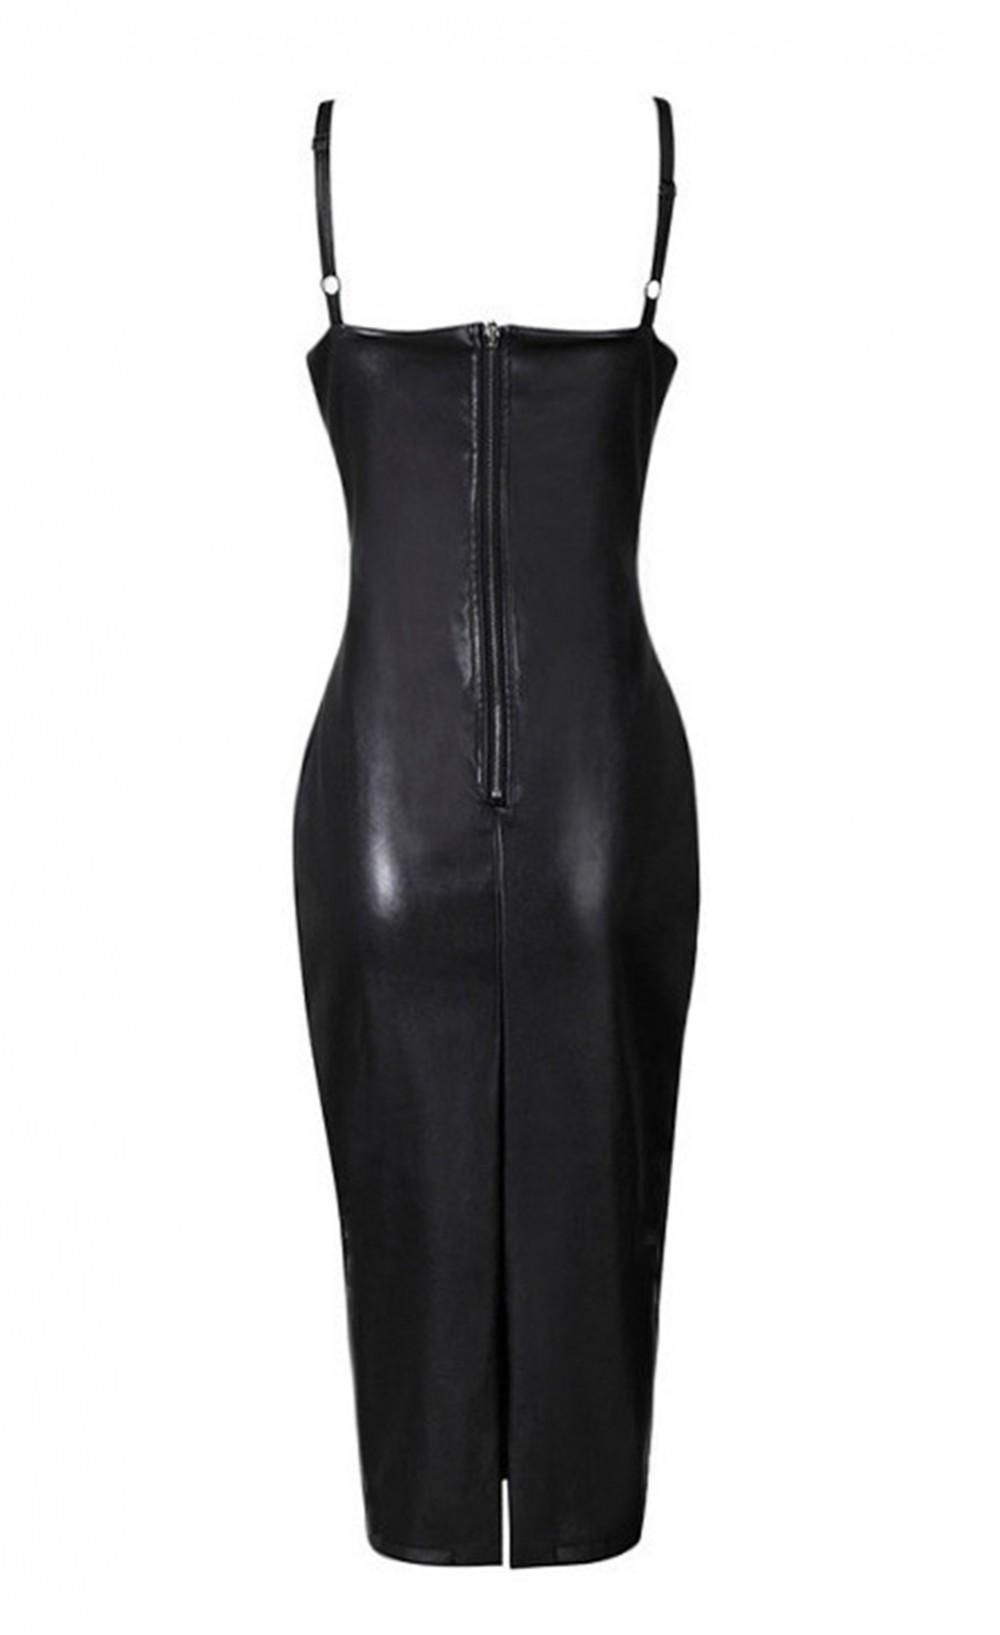 Black strappy faux leather dress